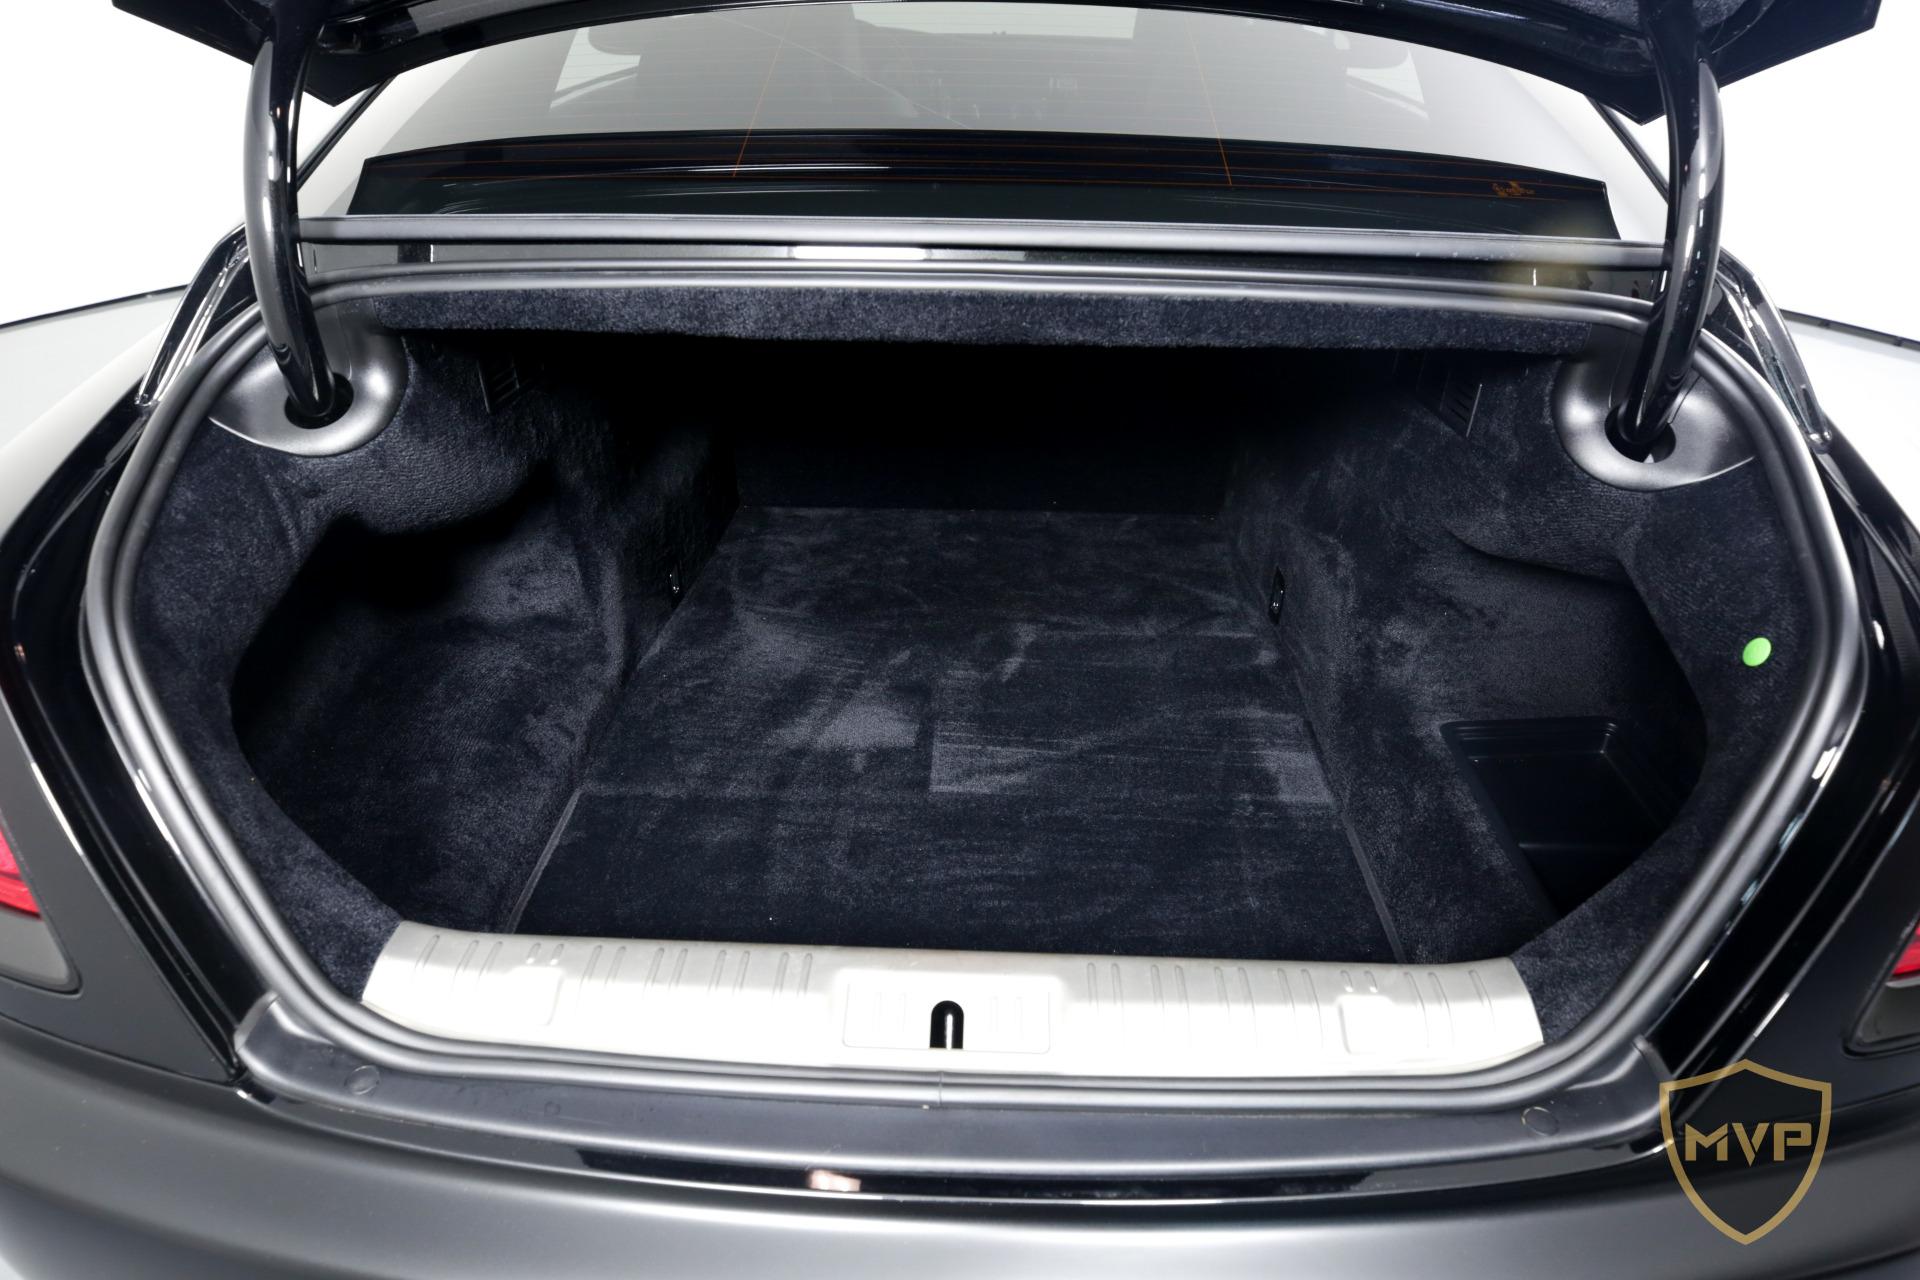 Used 2017 Rolls Royce Wraith For Sale 1 099 Mvp